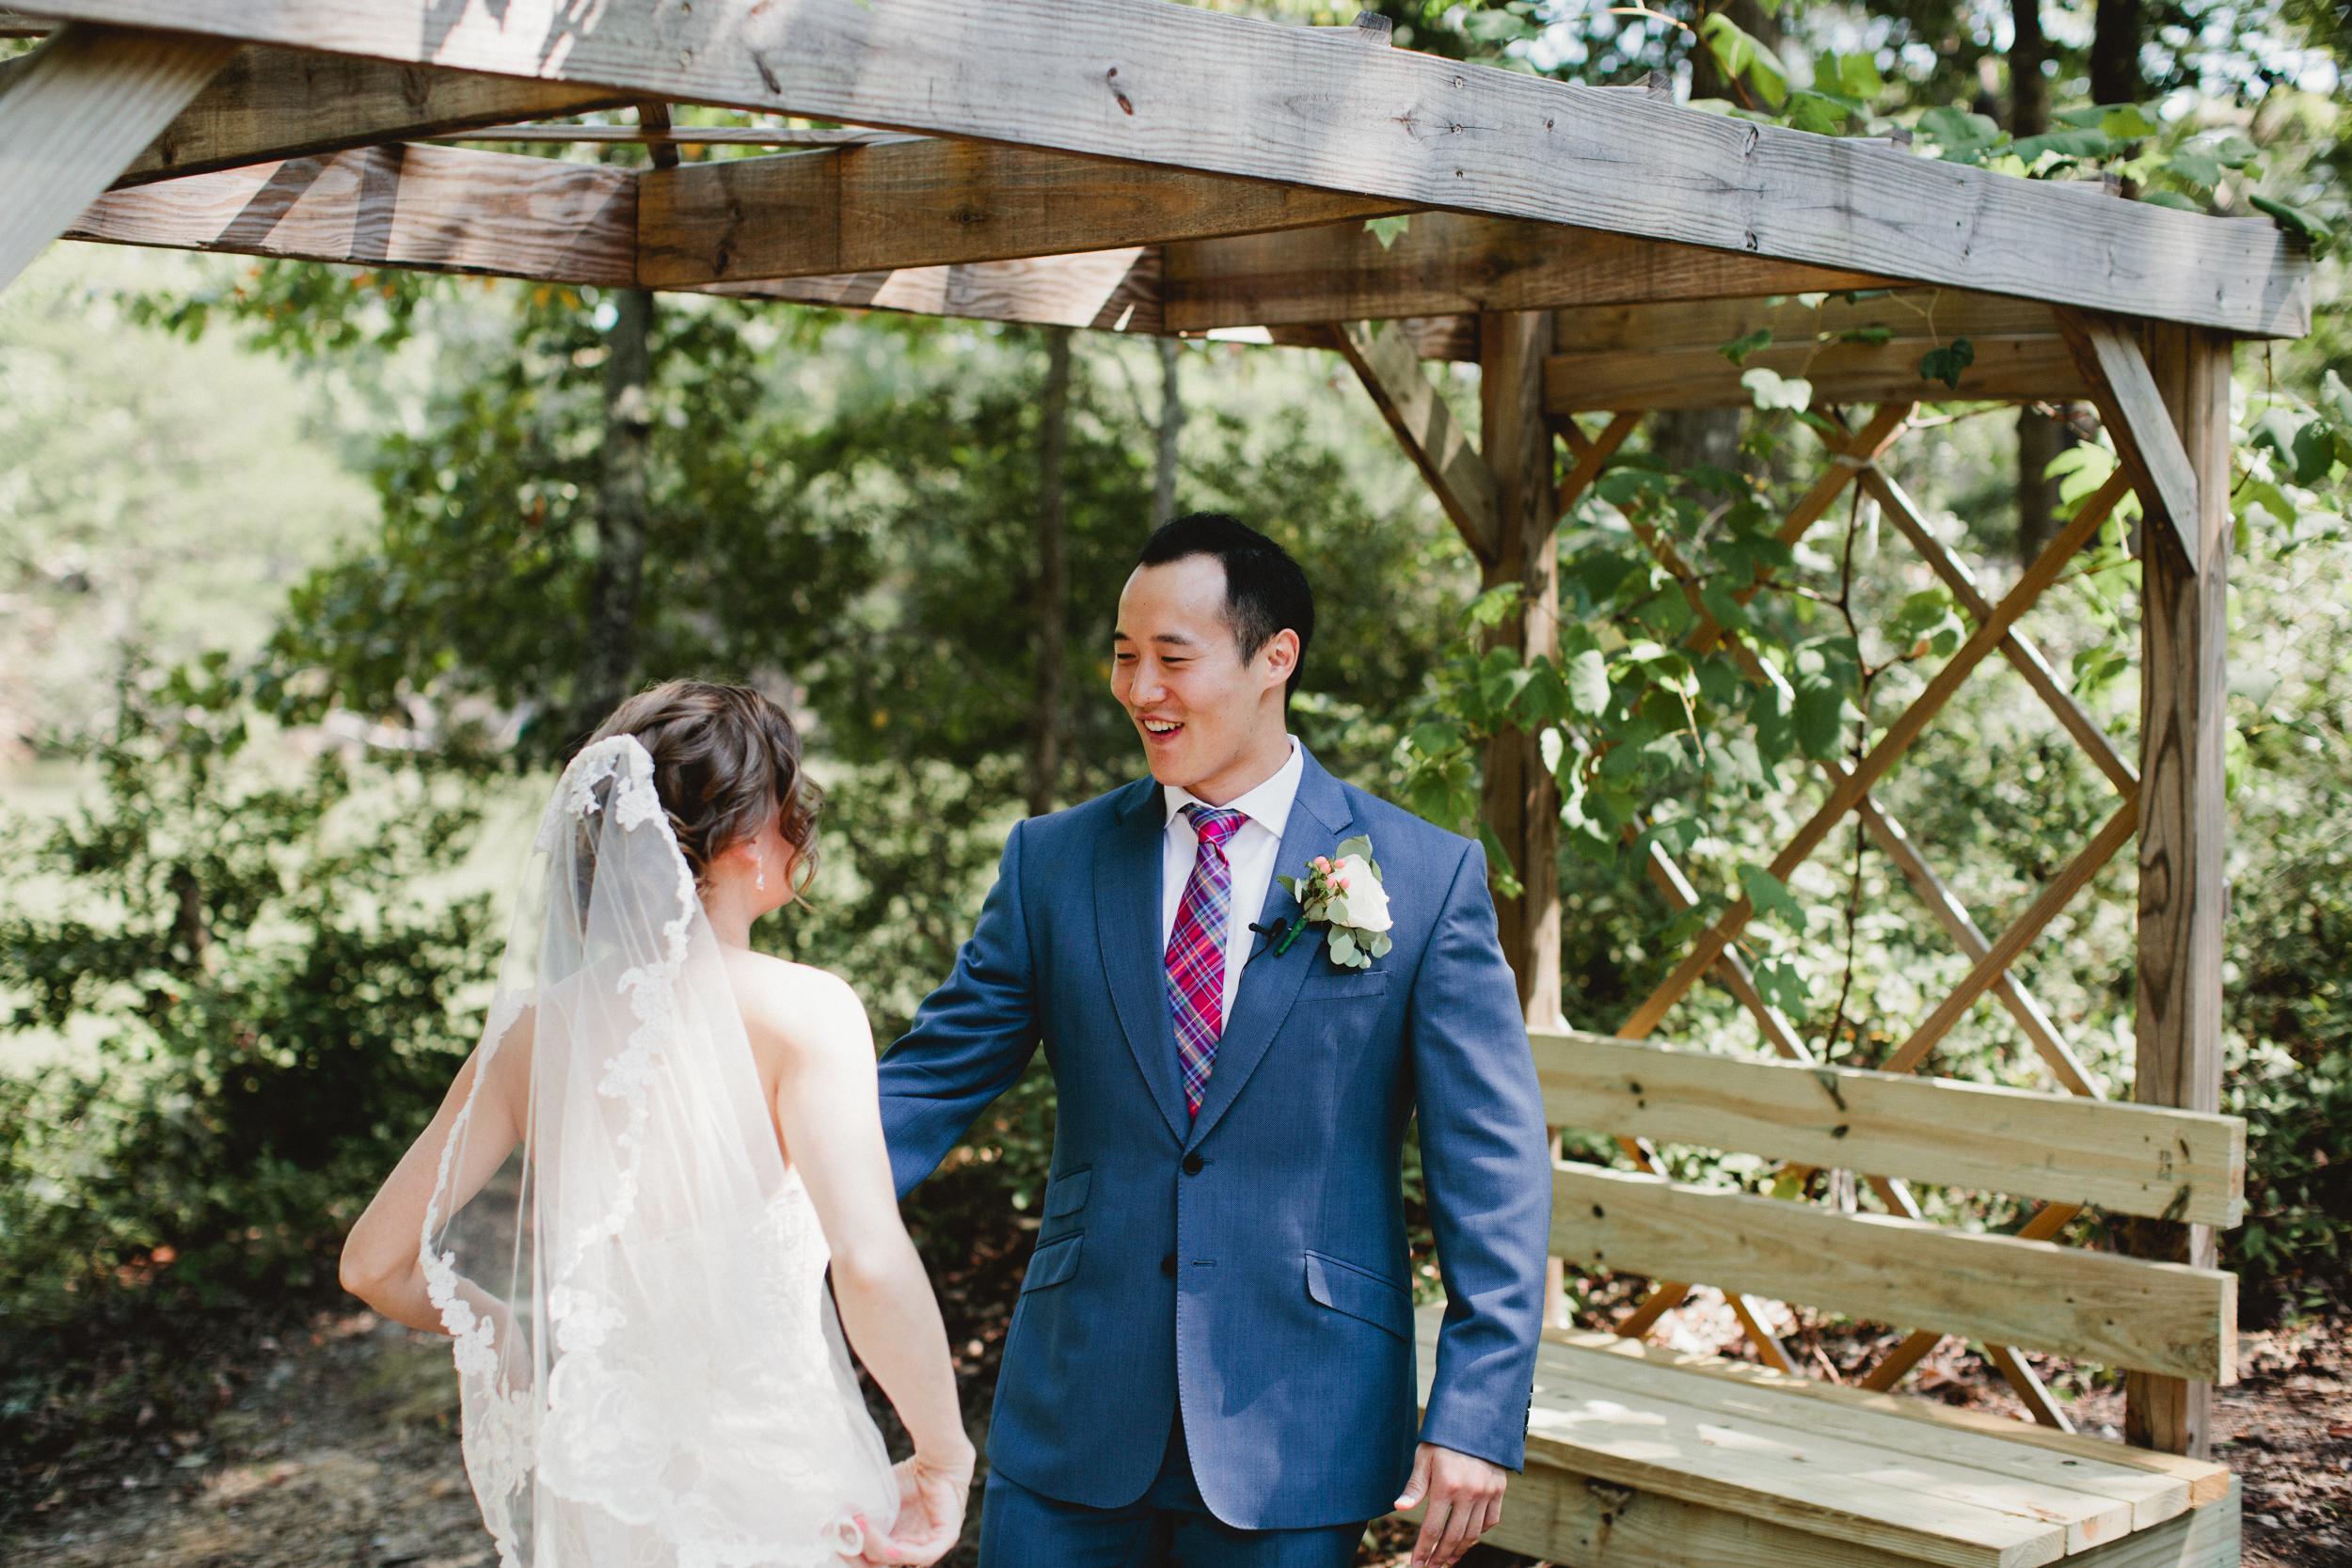 Maine-Wedding-Photographer-958.jpg